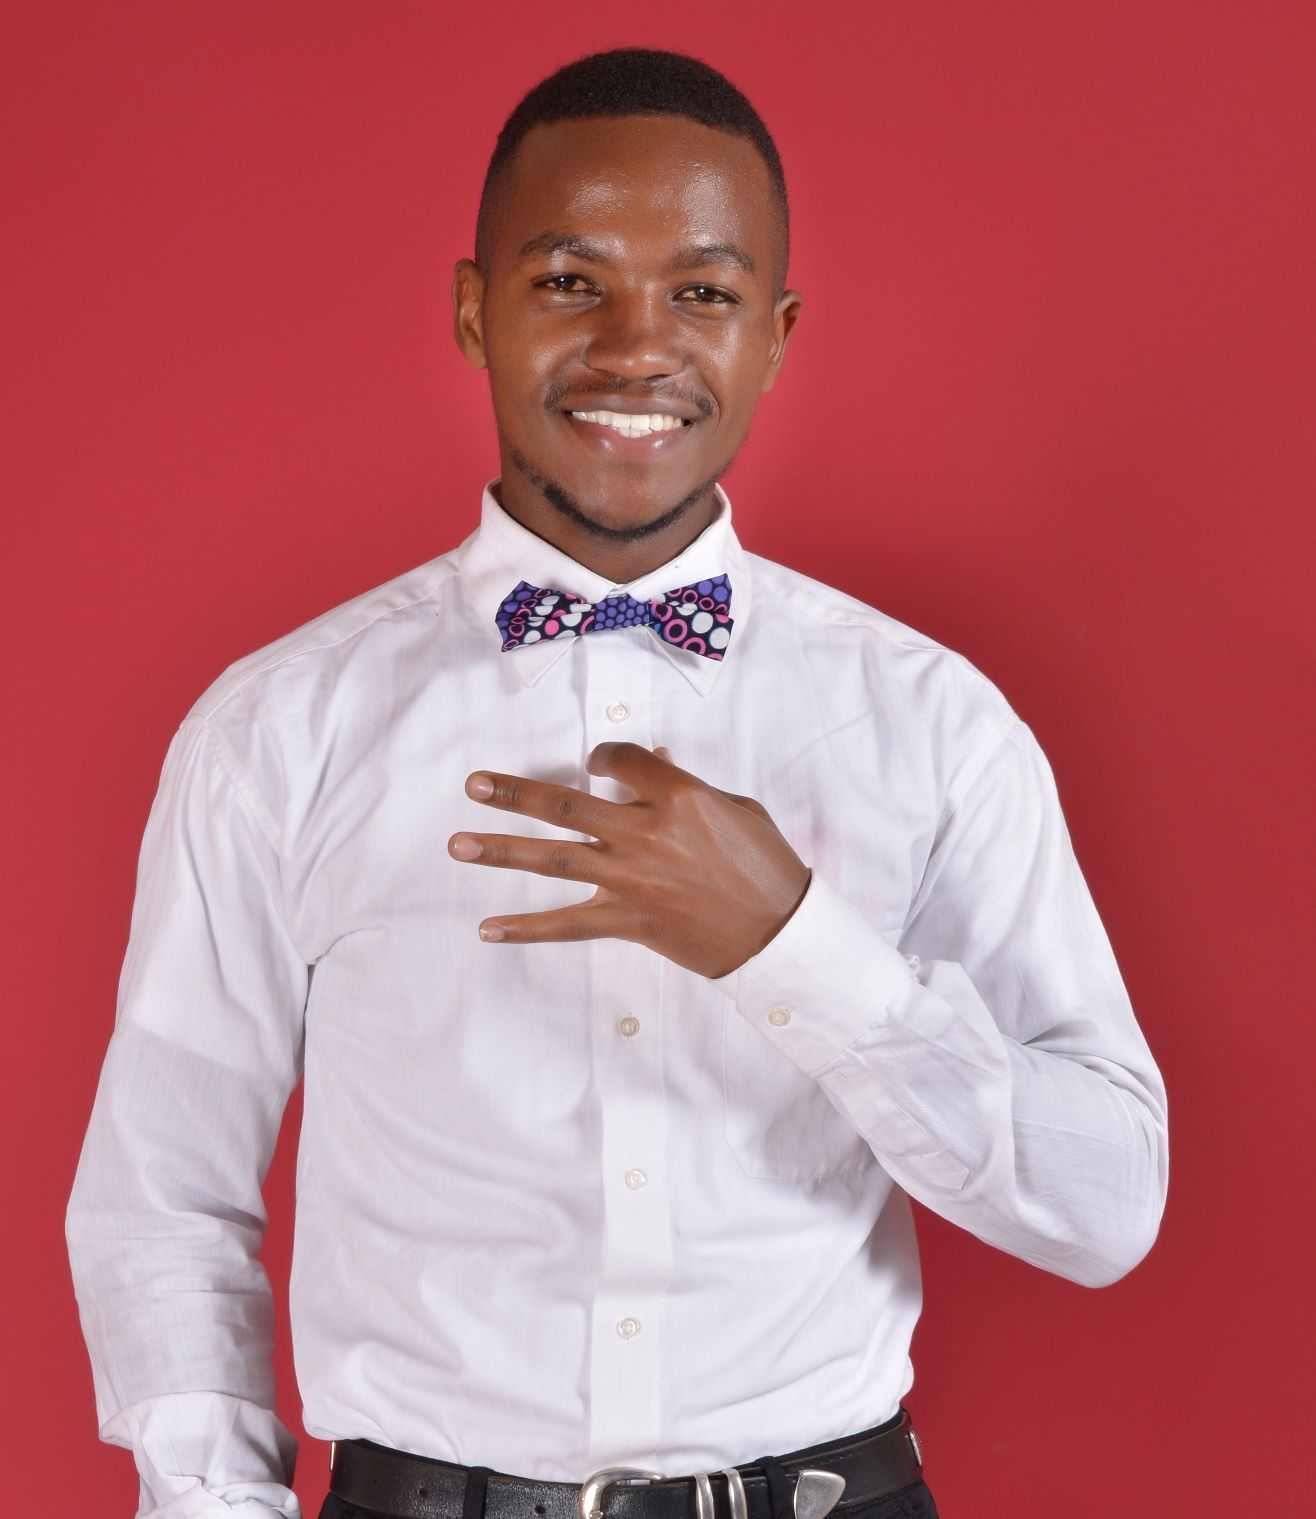 Donson Mutwiri Mburugu